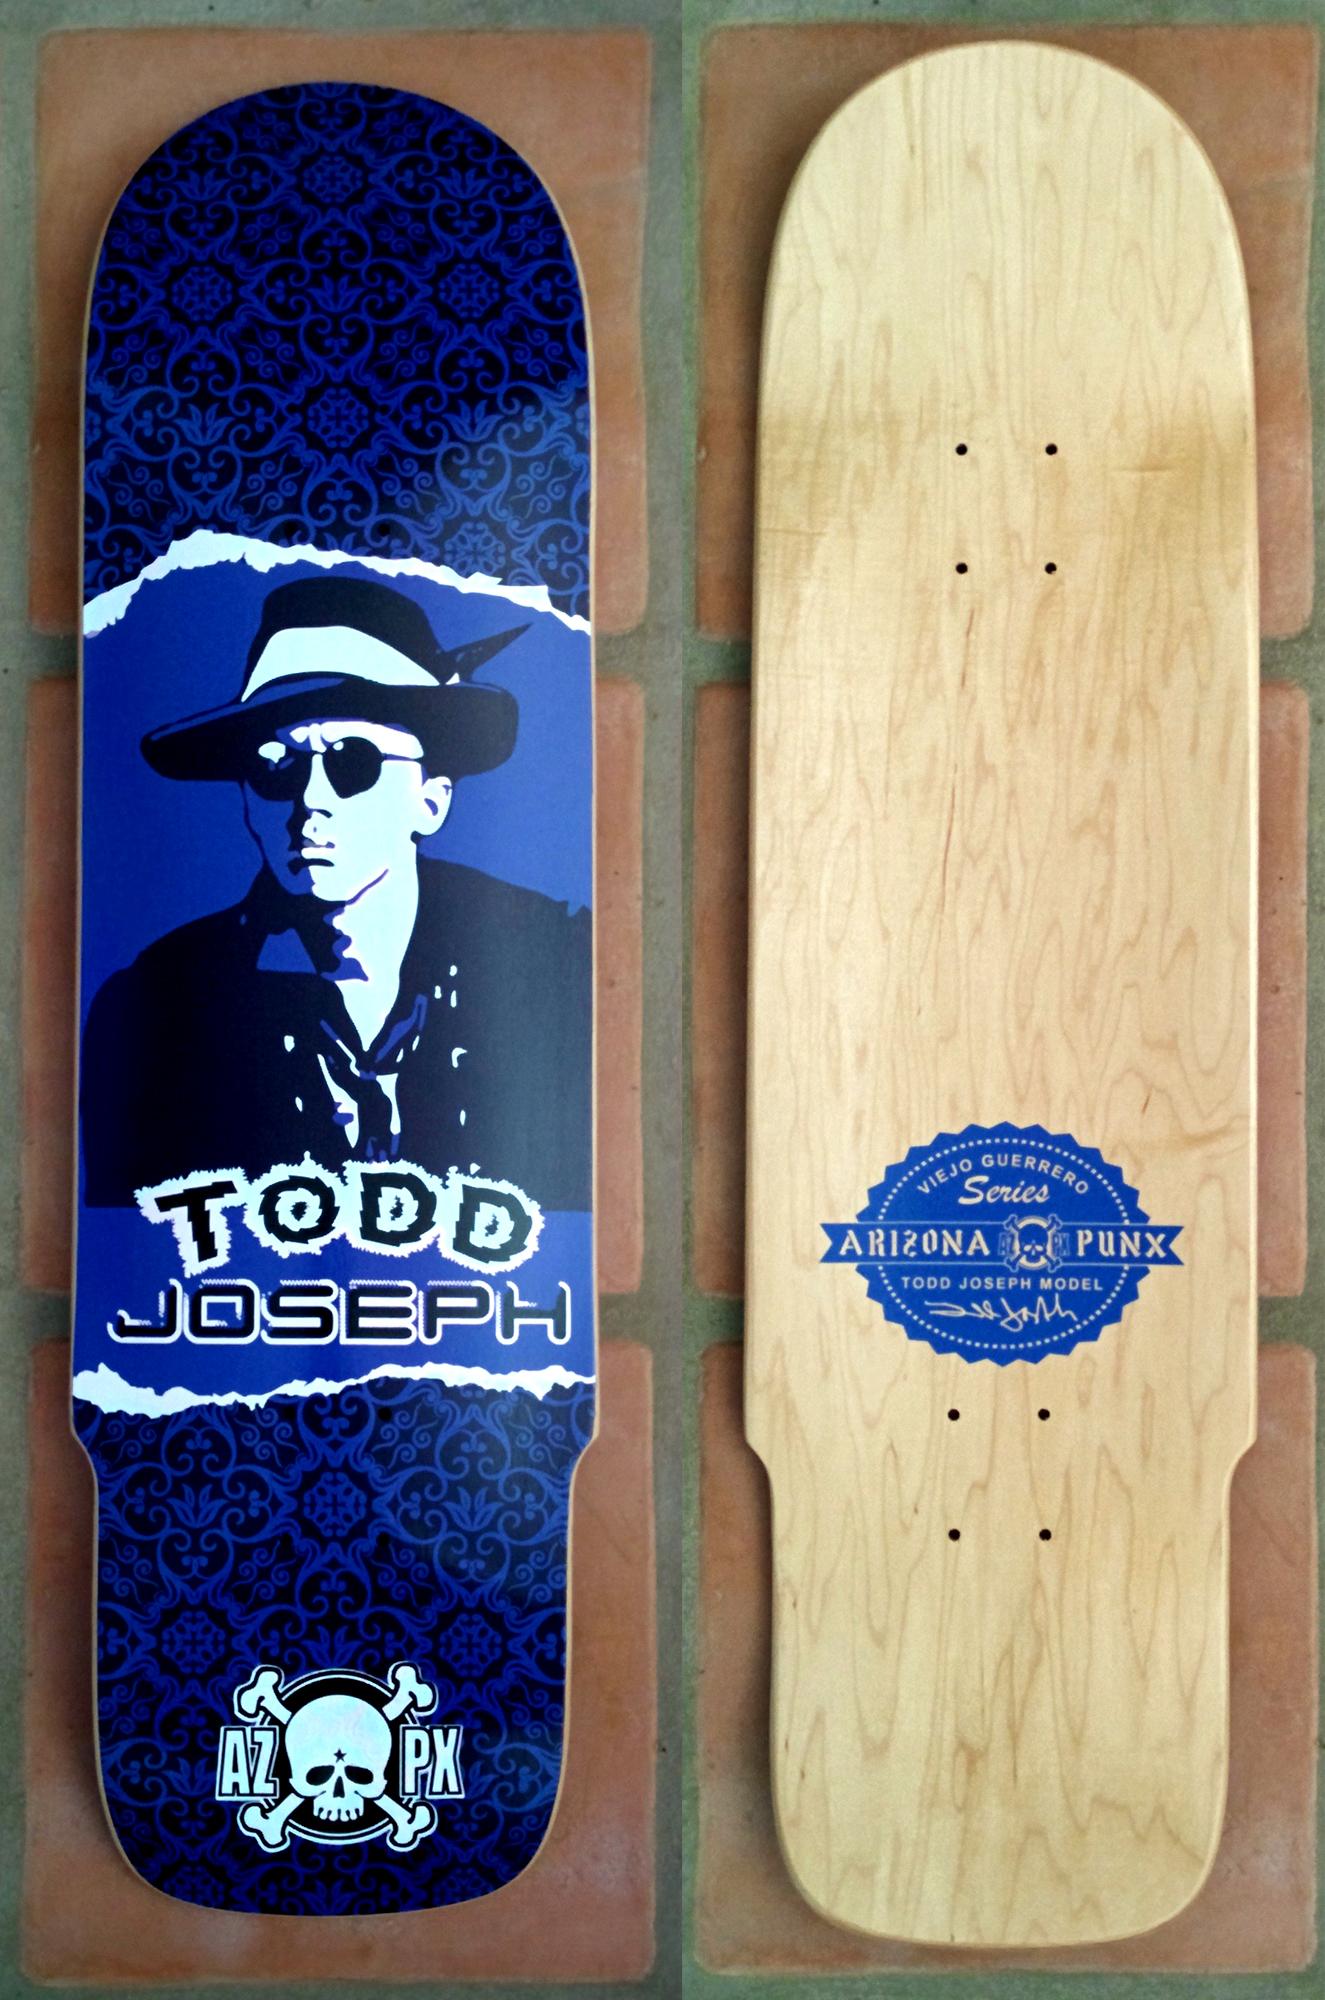 Todd-Joseph-Deck